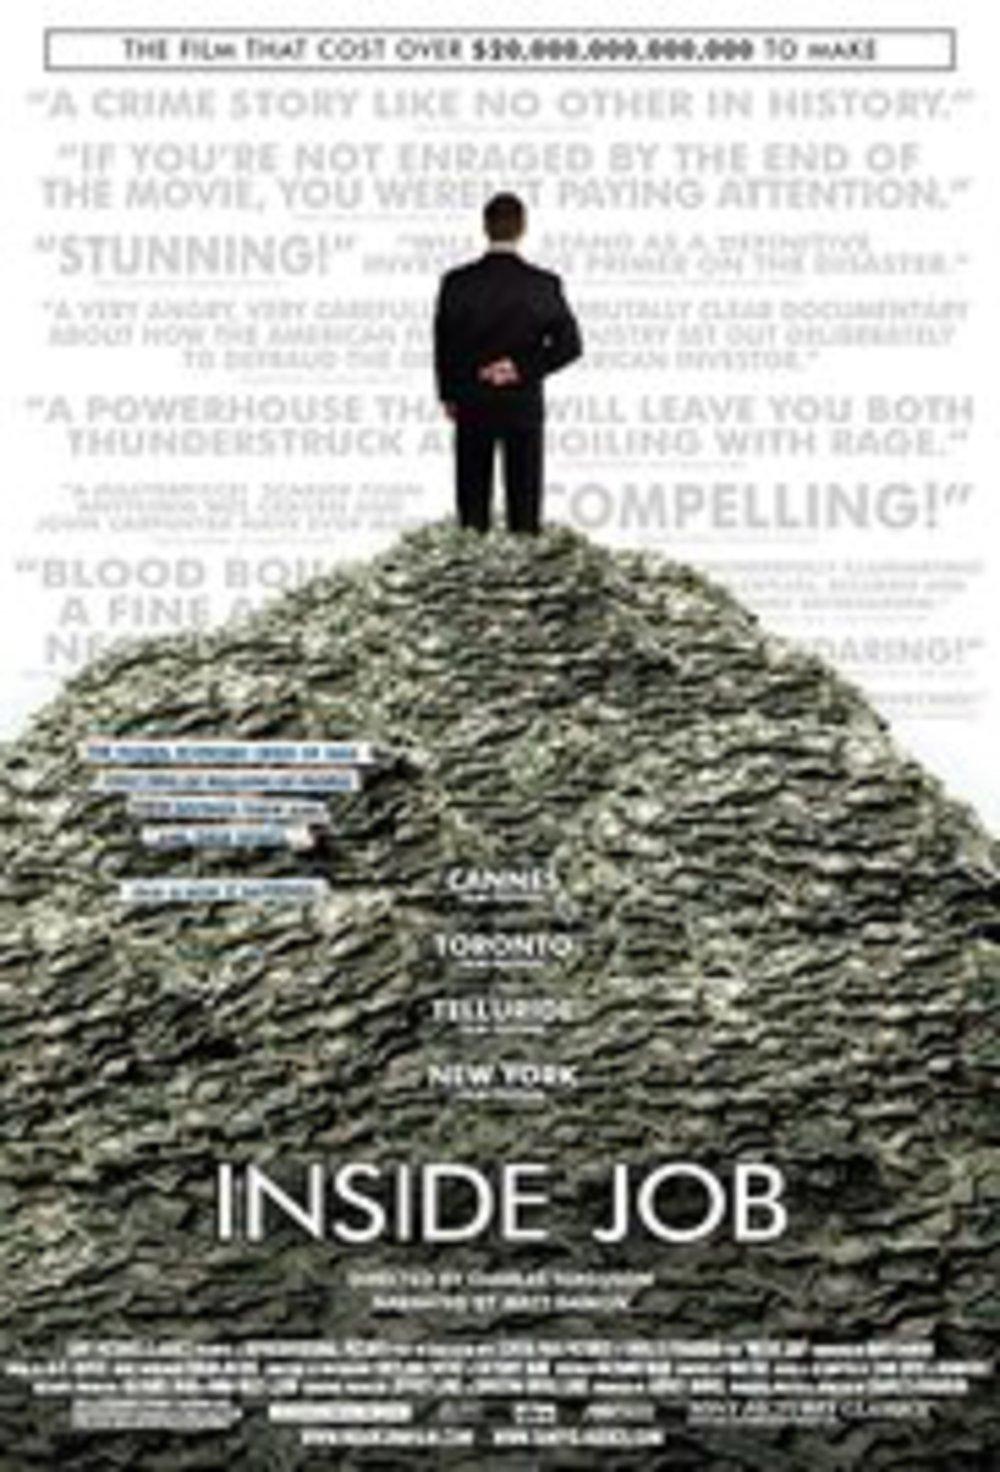 Inside Job (2010) - IMDb